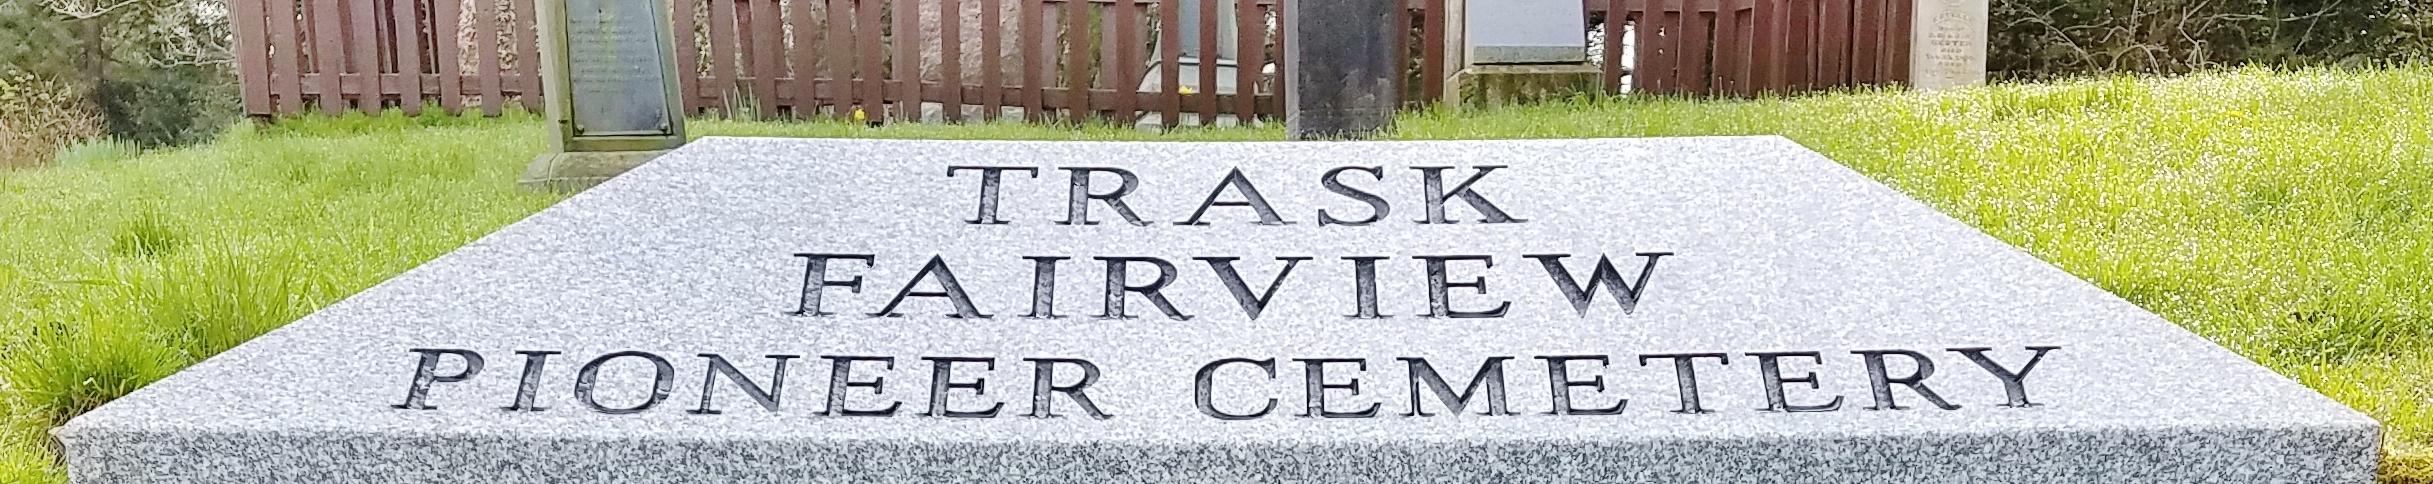 Fairview Pioneer Cemetery